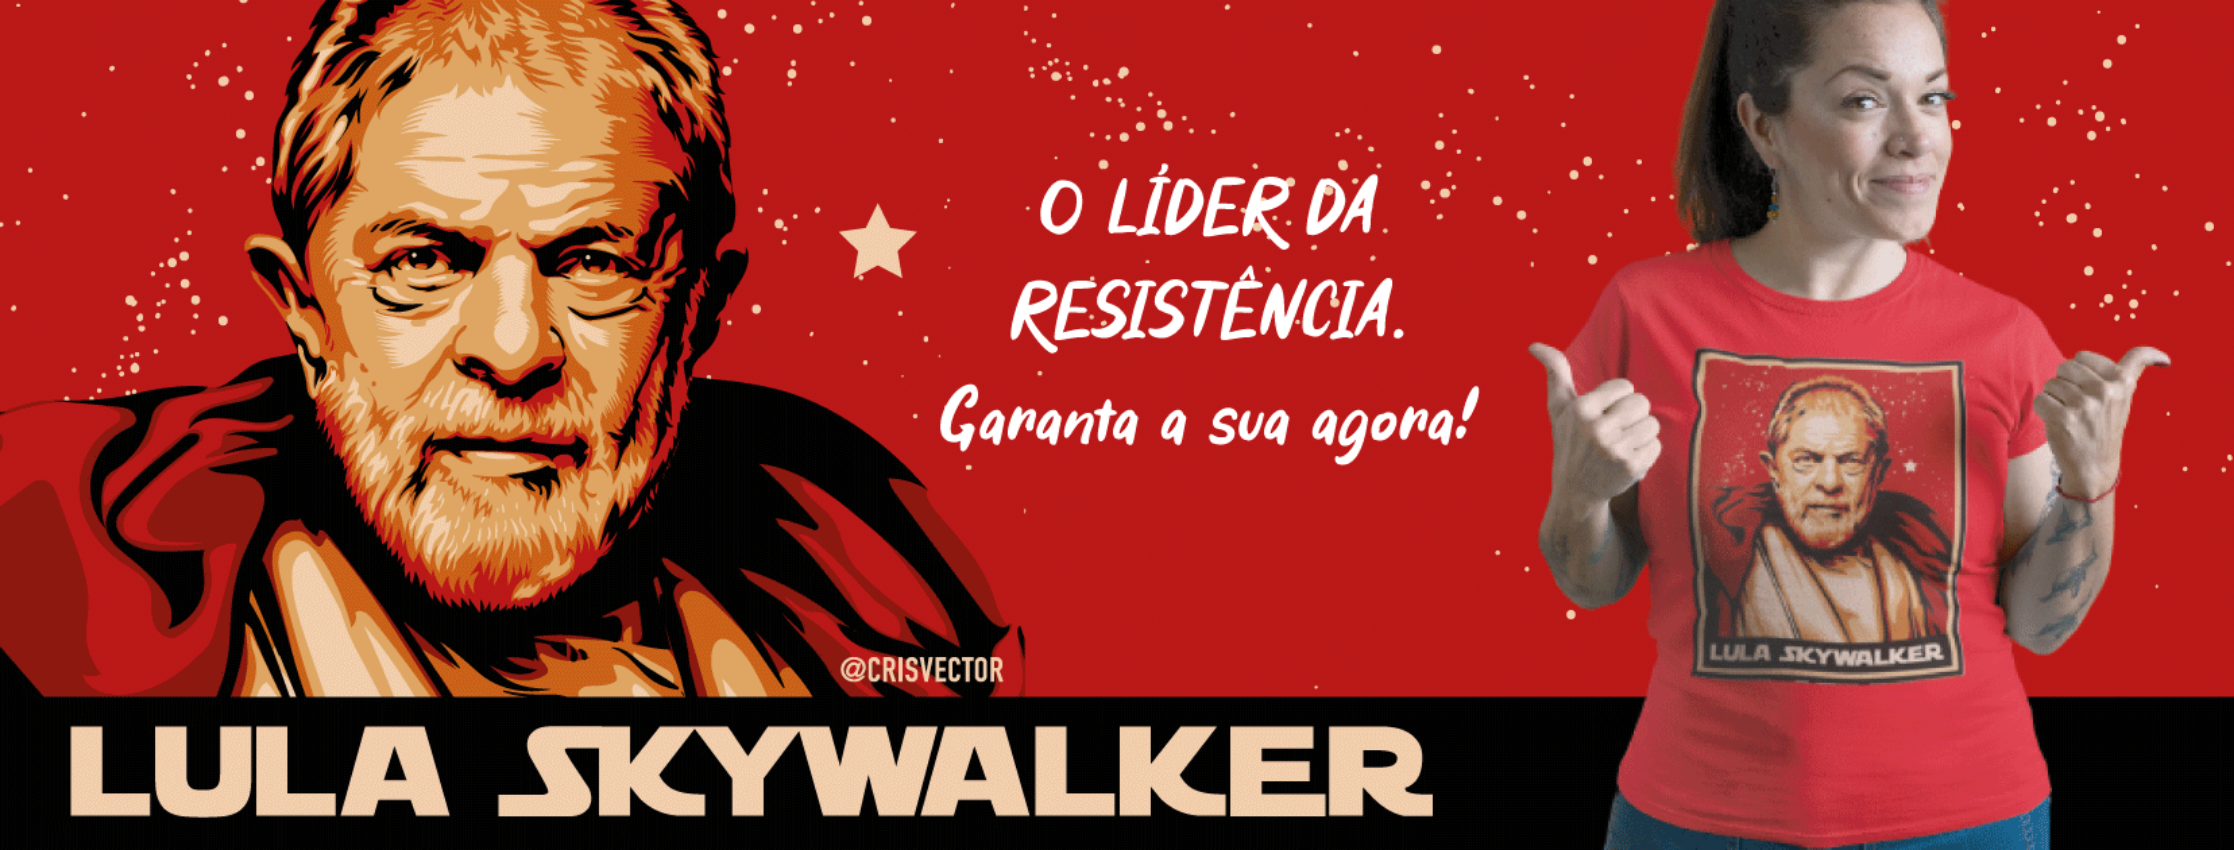 Lula Skywalker